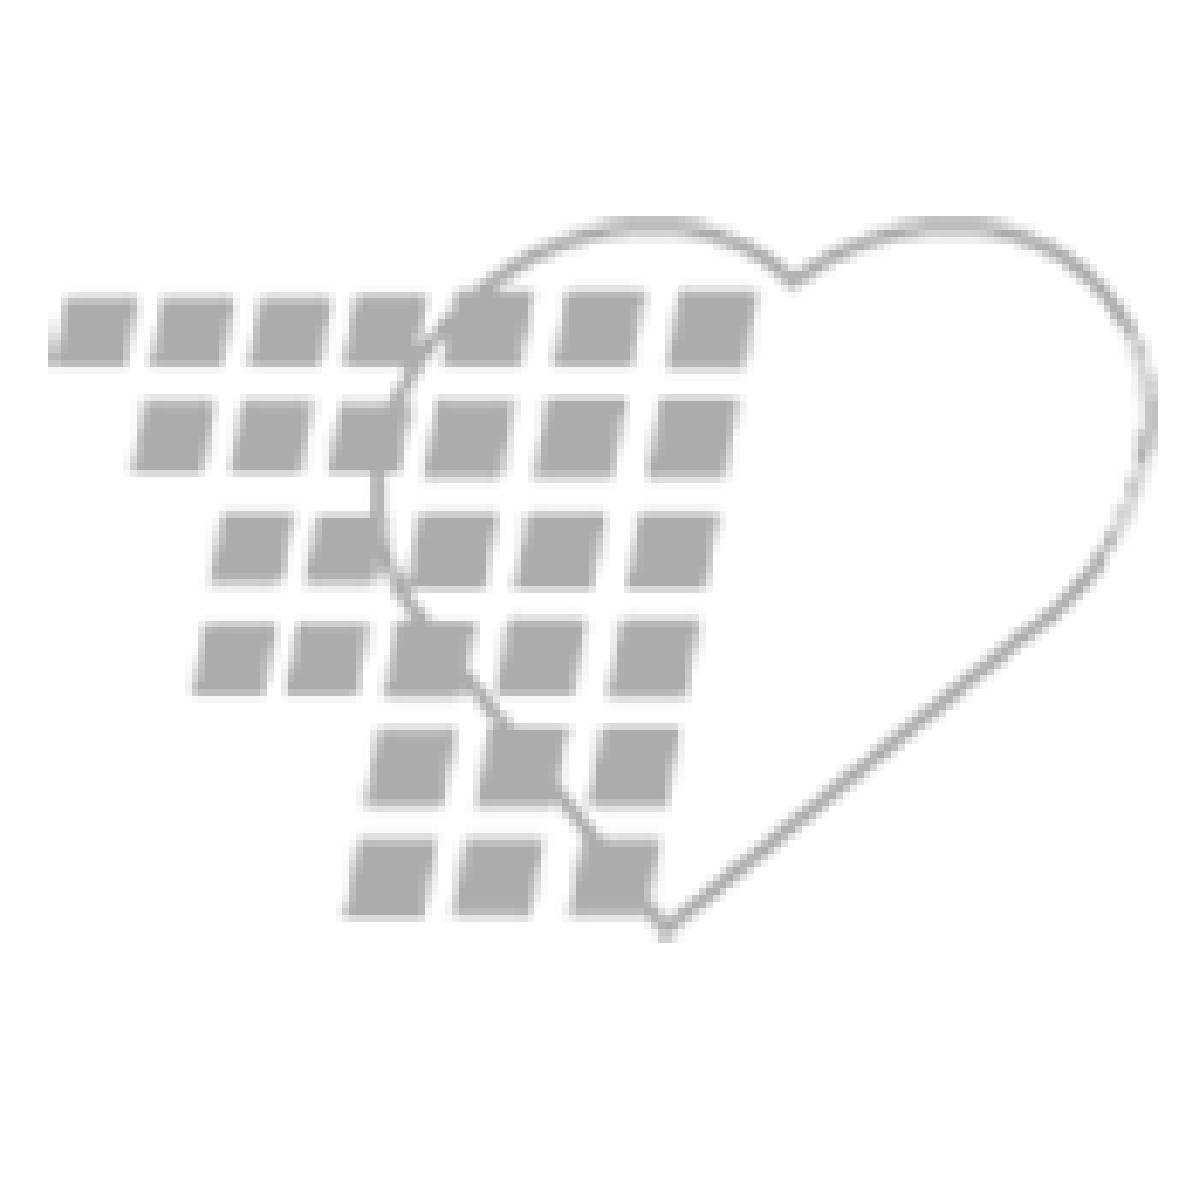 06-44-2500 - DuoDote® Auto Injector Trainer